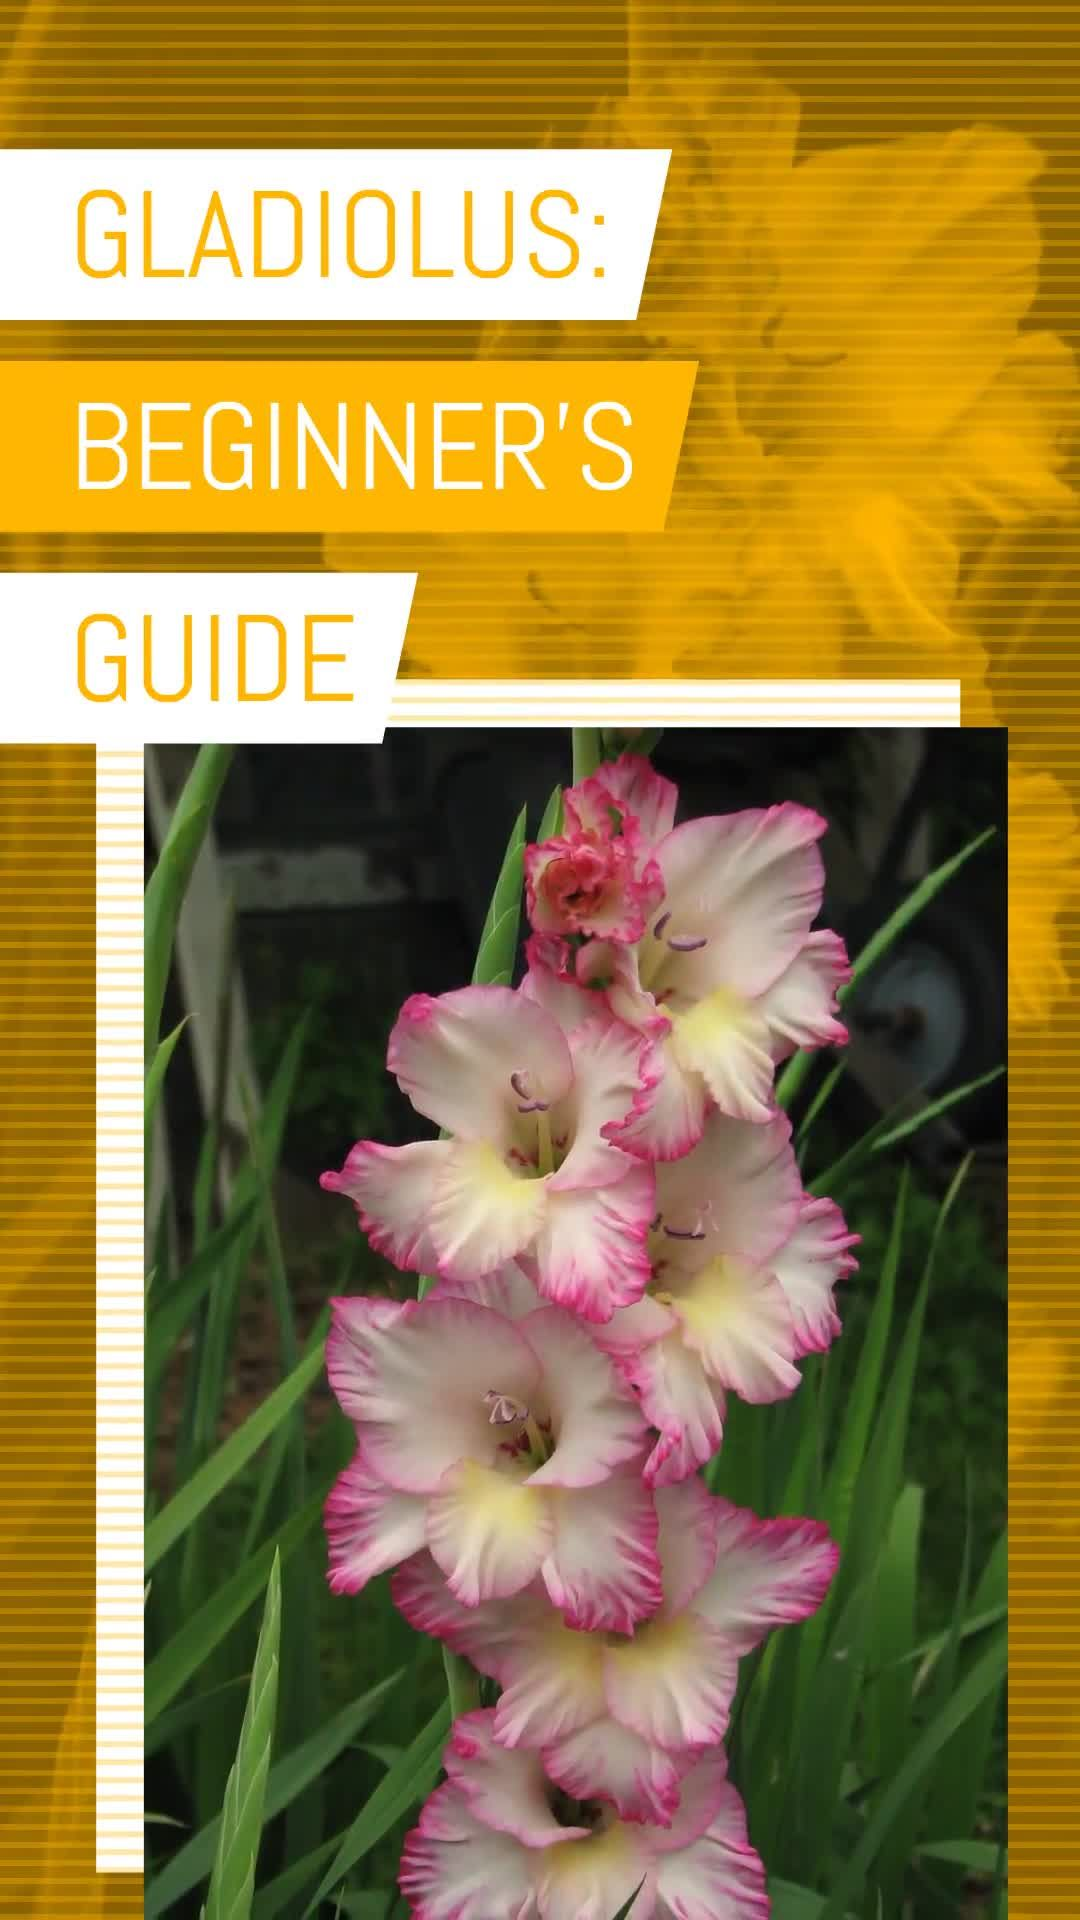 Gladiolus Beginner S Guide Video In 2020 Gladiolus Flower Care Gardening For Beginners